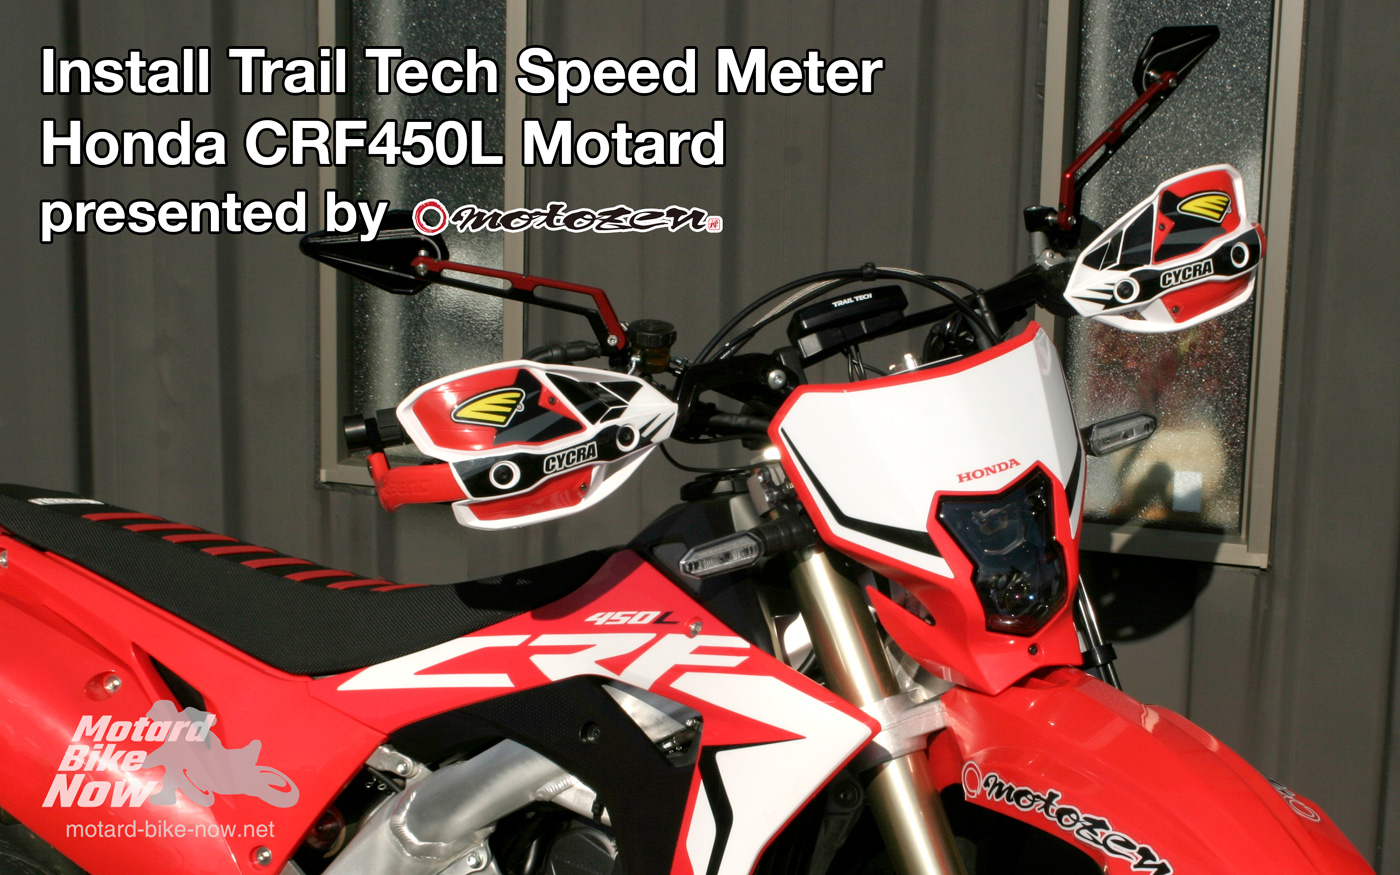 CRF450L モタード化プロジェクト Vol.7 Trail Tech トレイルテック Vapor ベイパーメーターを取り付け